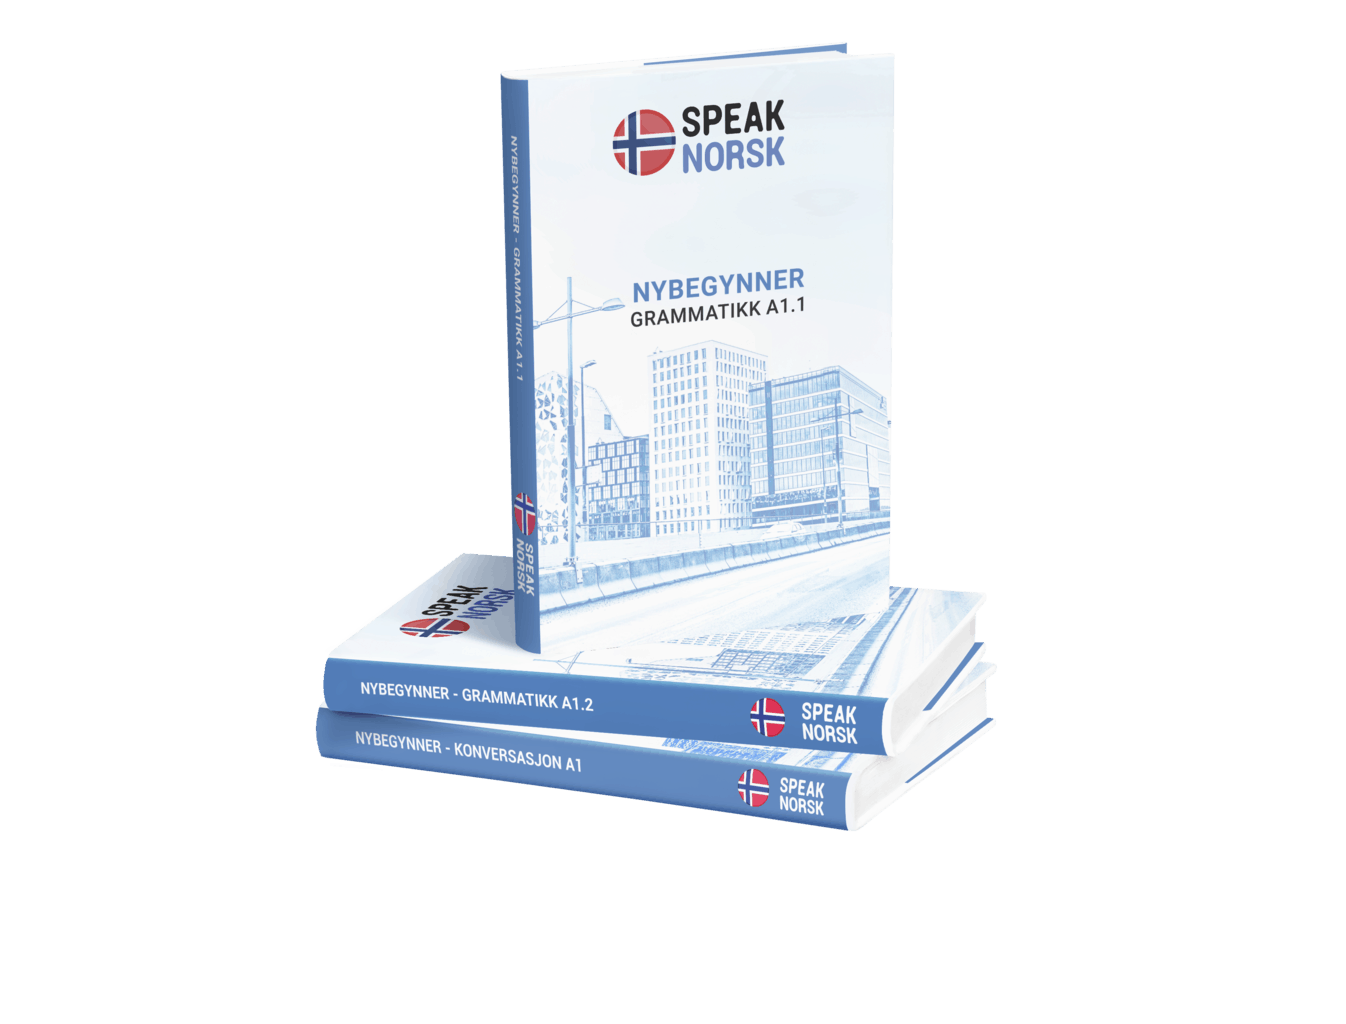 SpeakNorsk_booksA1_pile_flat fixed